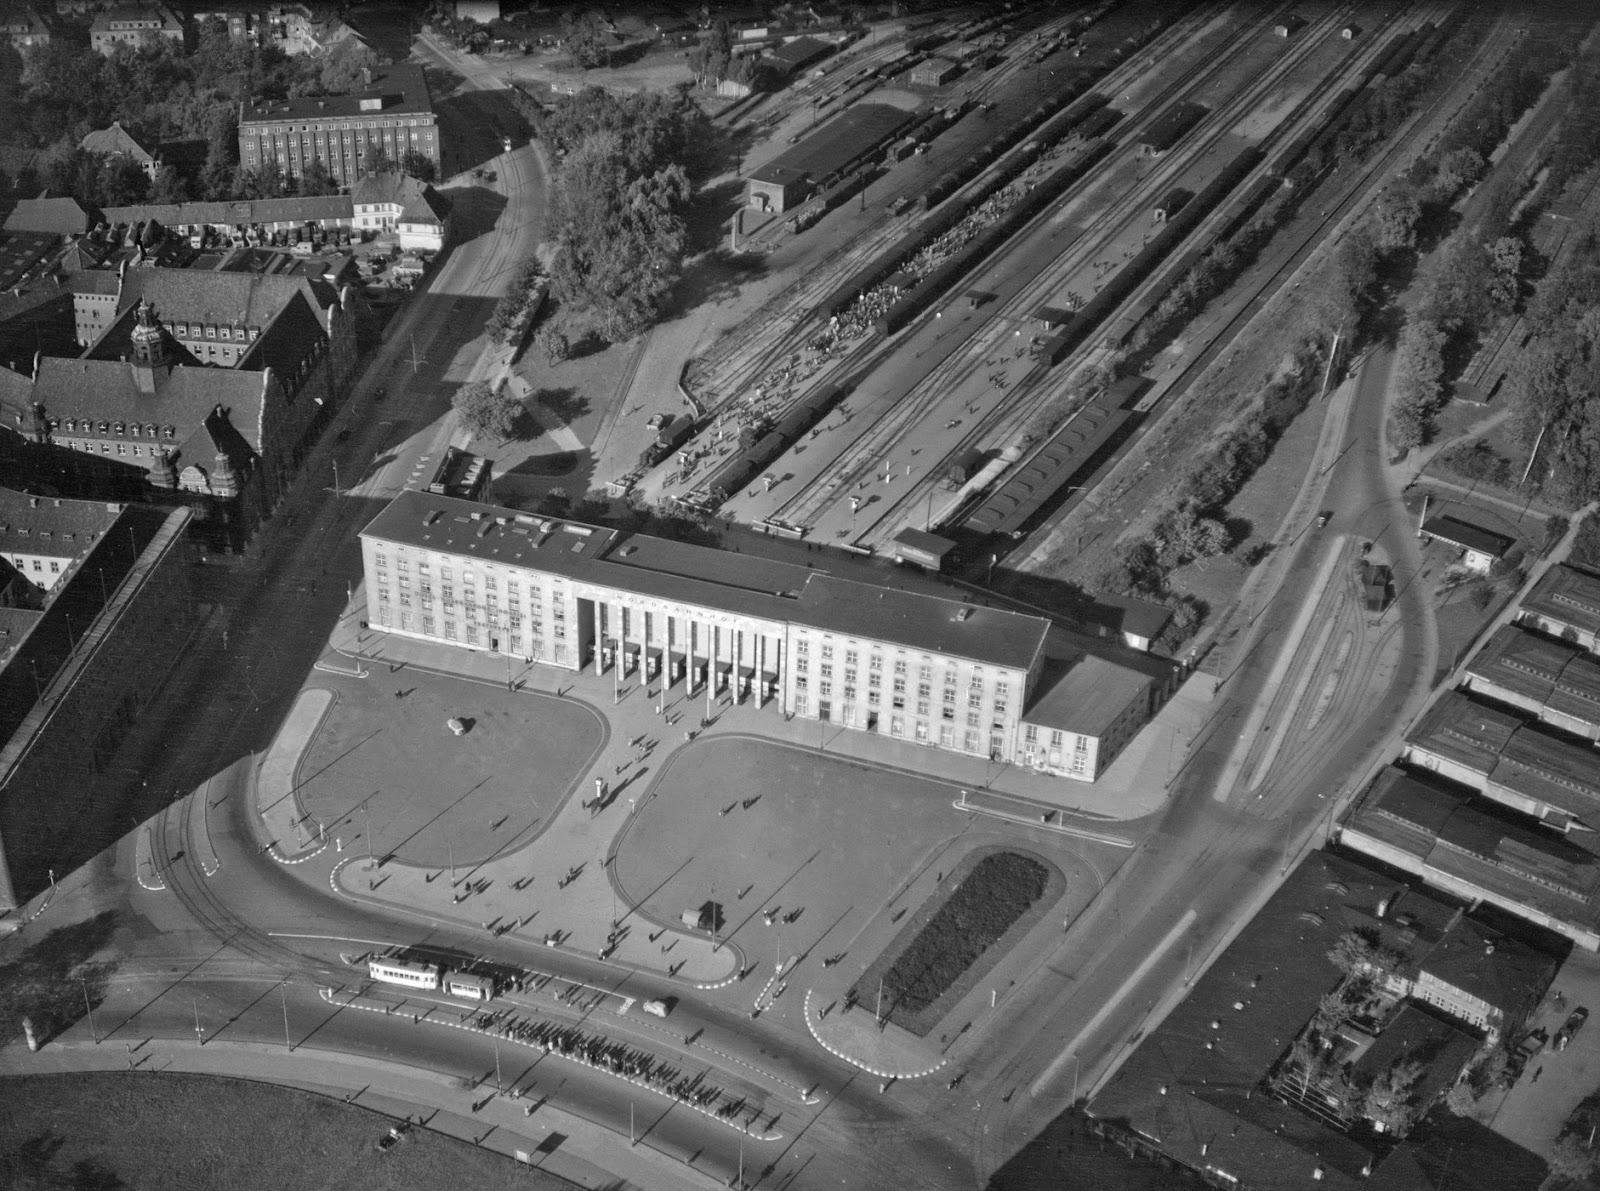 Aerial View of Königsberg (now Kaliningrad), Russia from 1942-1944 (31)